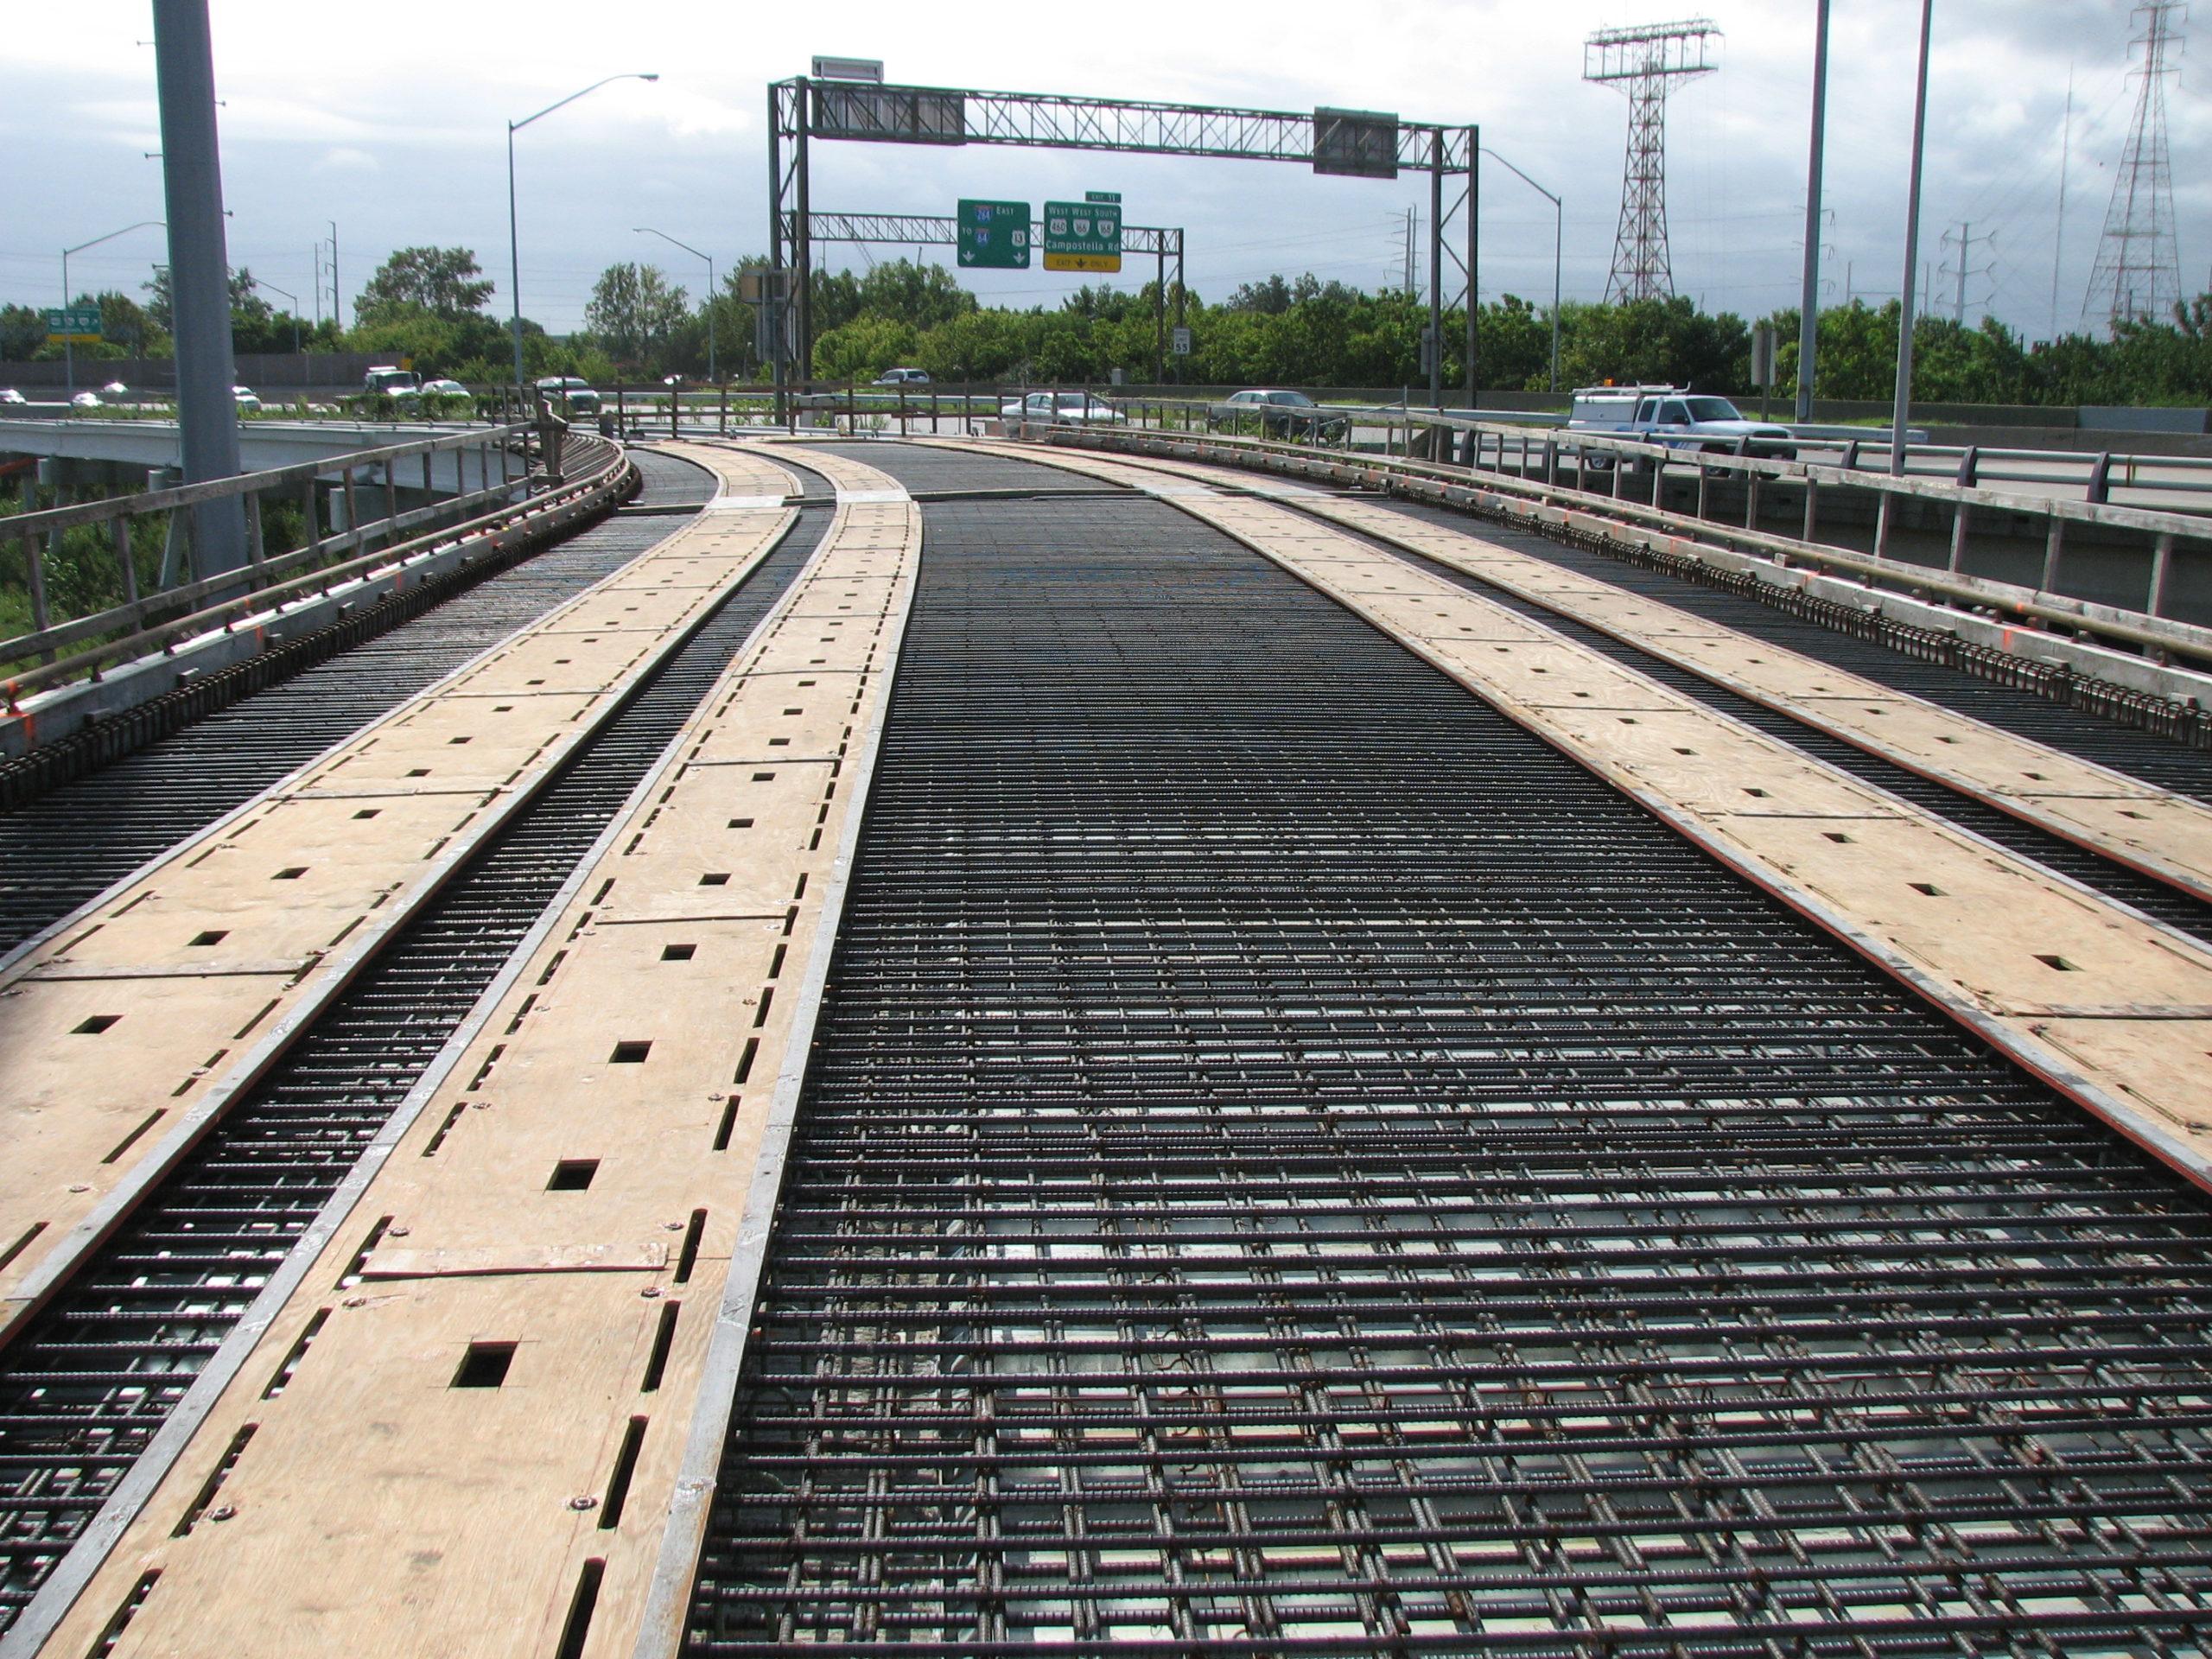 Deck forming and rebar adjacent to I-264.